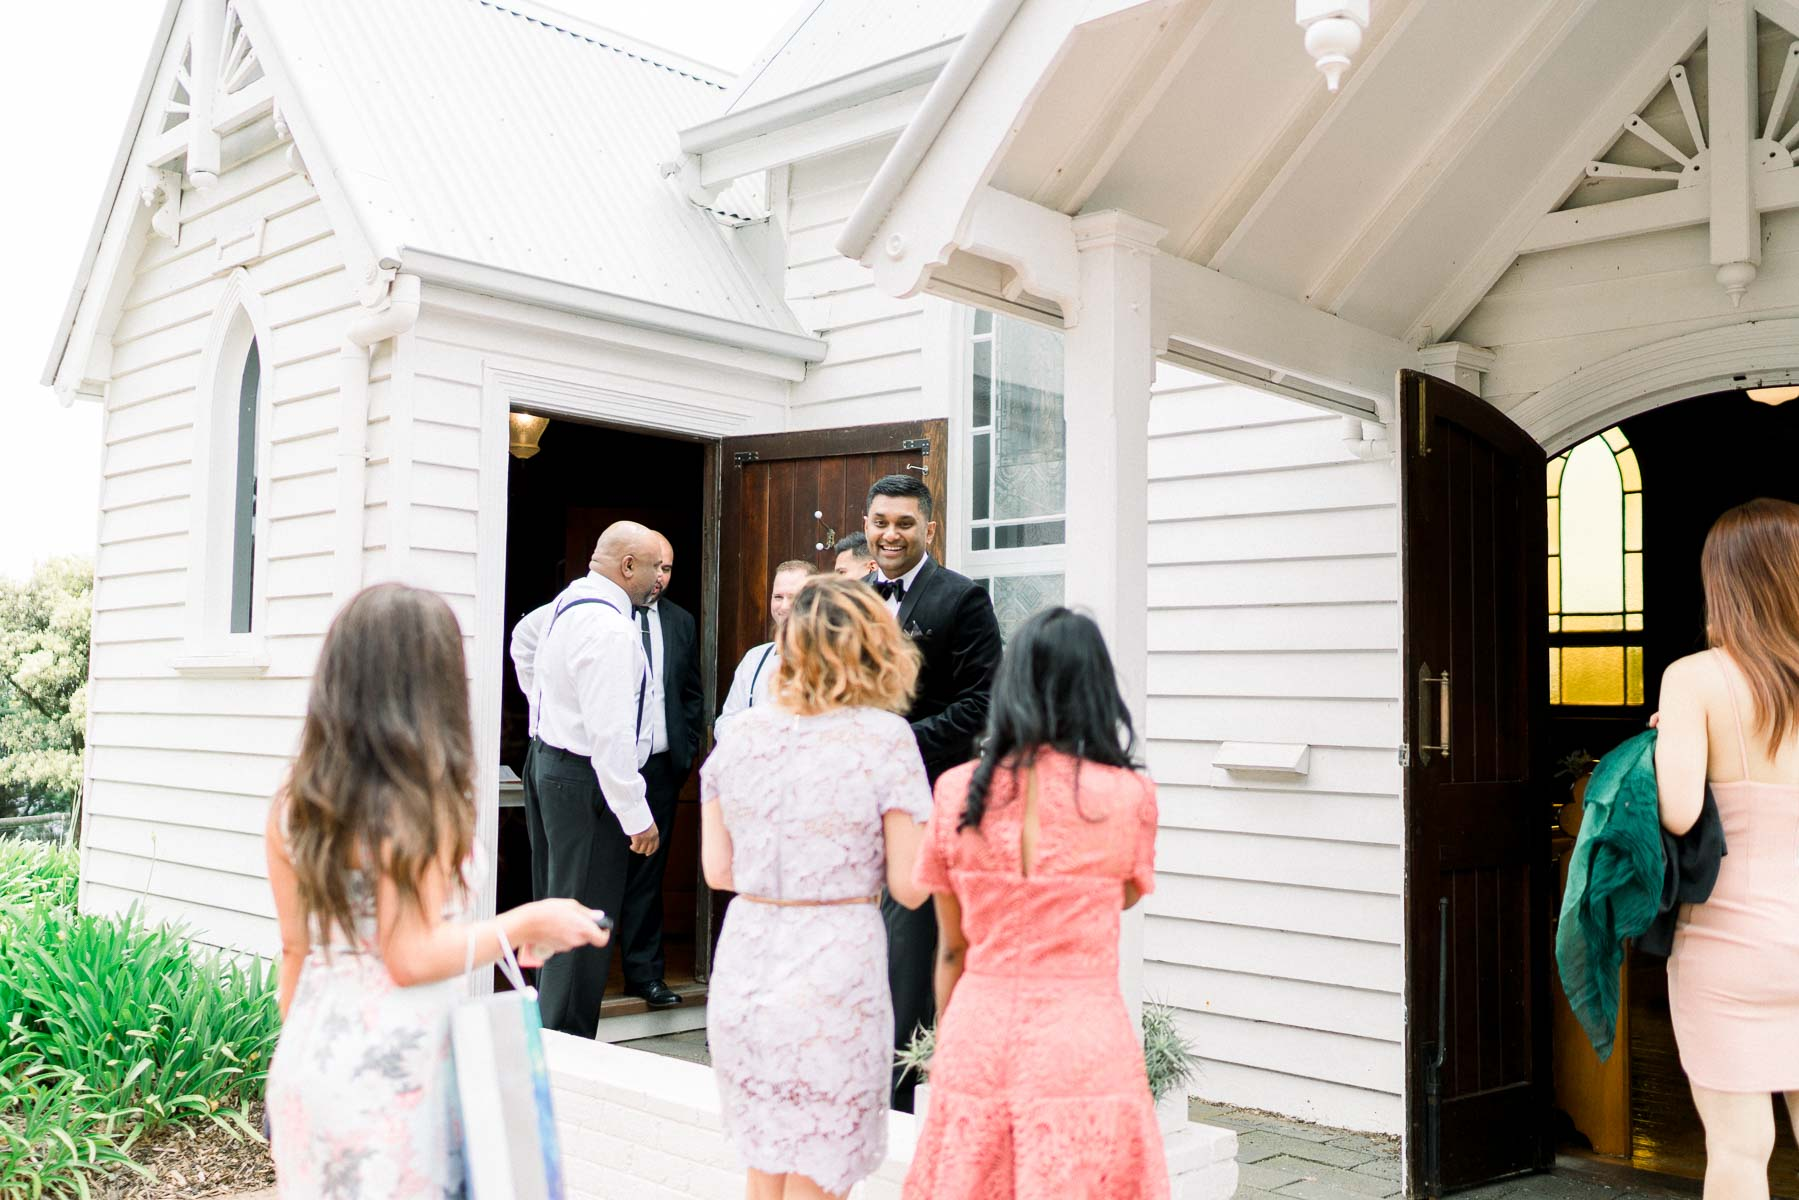 trenavin-chapel-phillip-island-wedding-heart+soul-weddings-sally-sean-00054.jpg